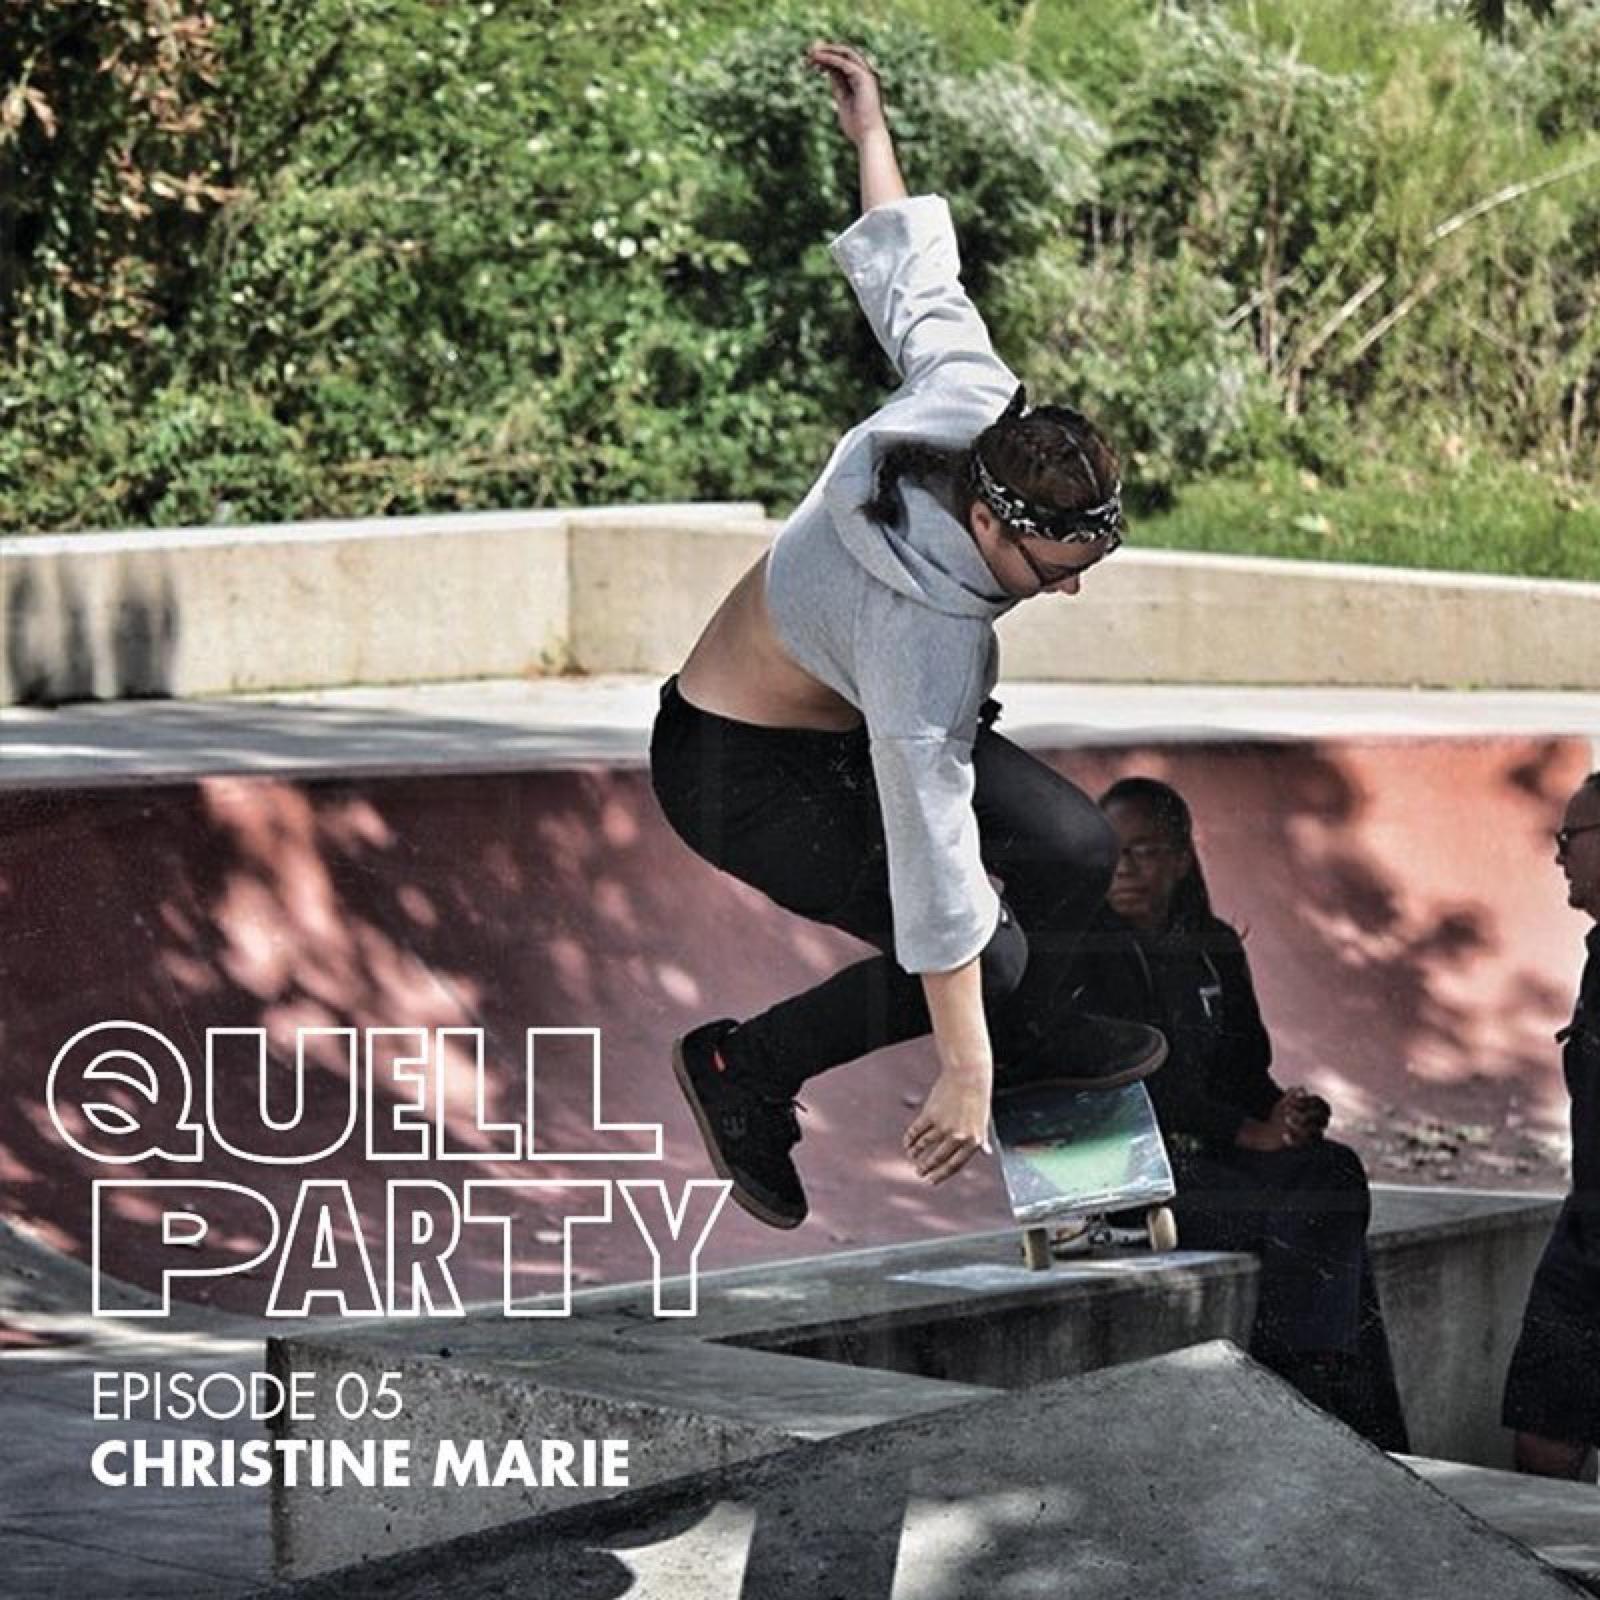 Christine Marie